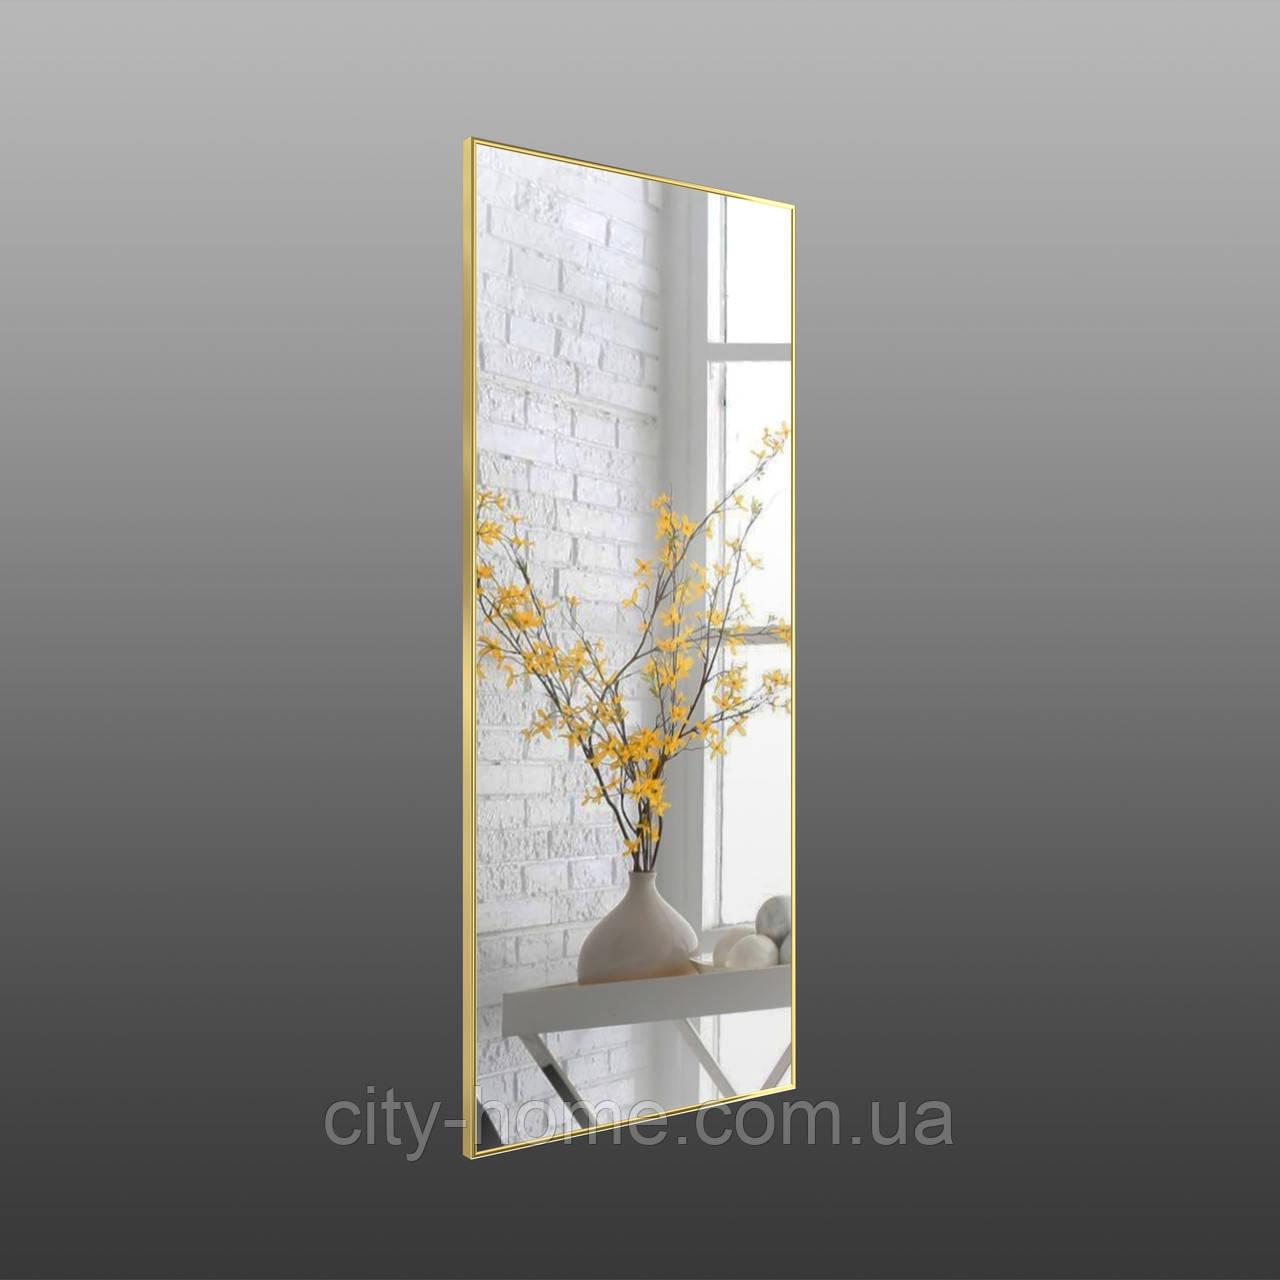 Зеркало в рост золото - хром